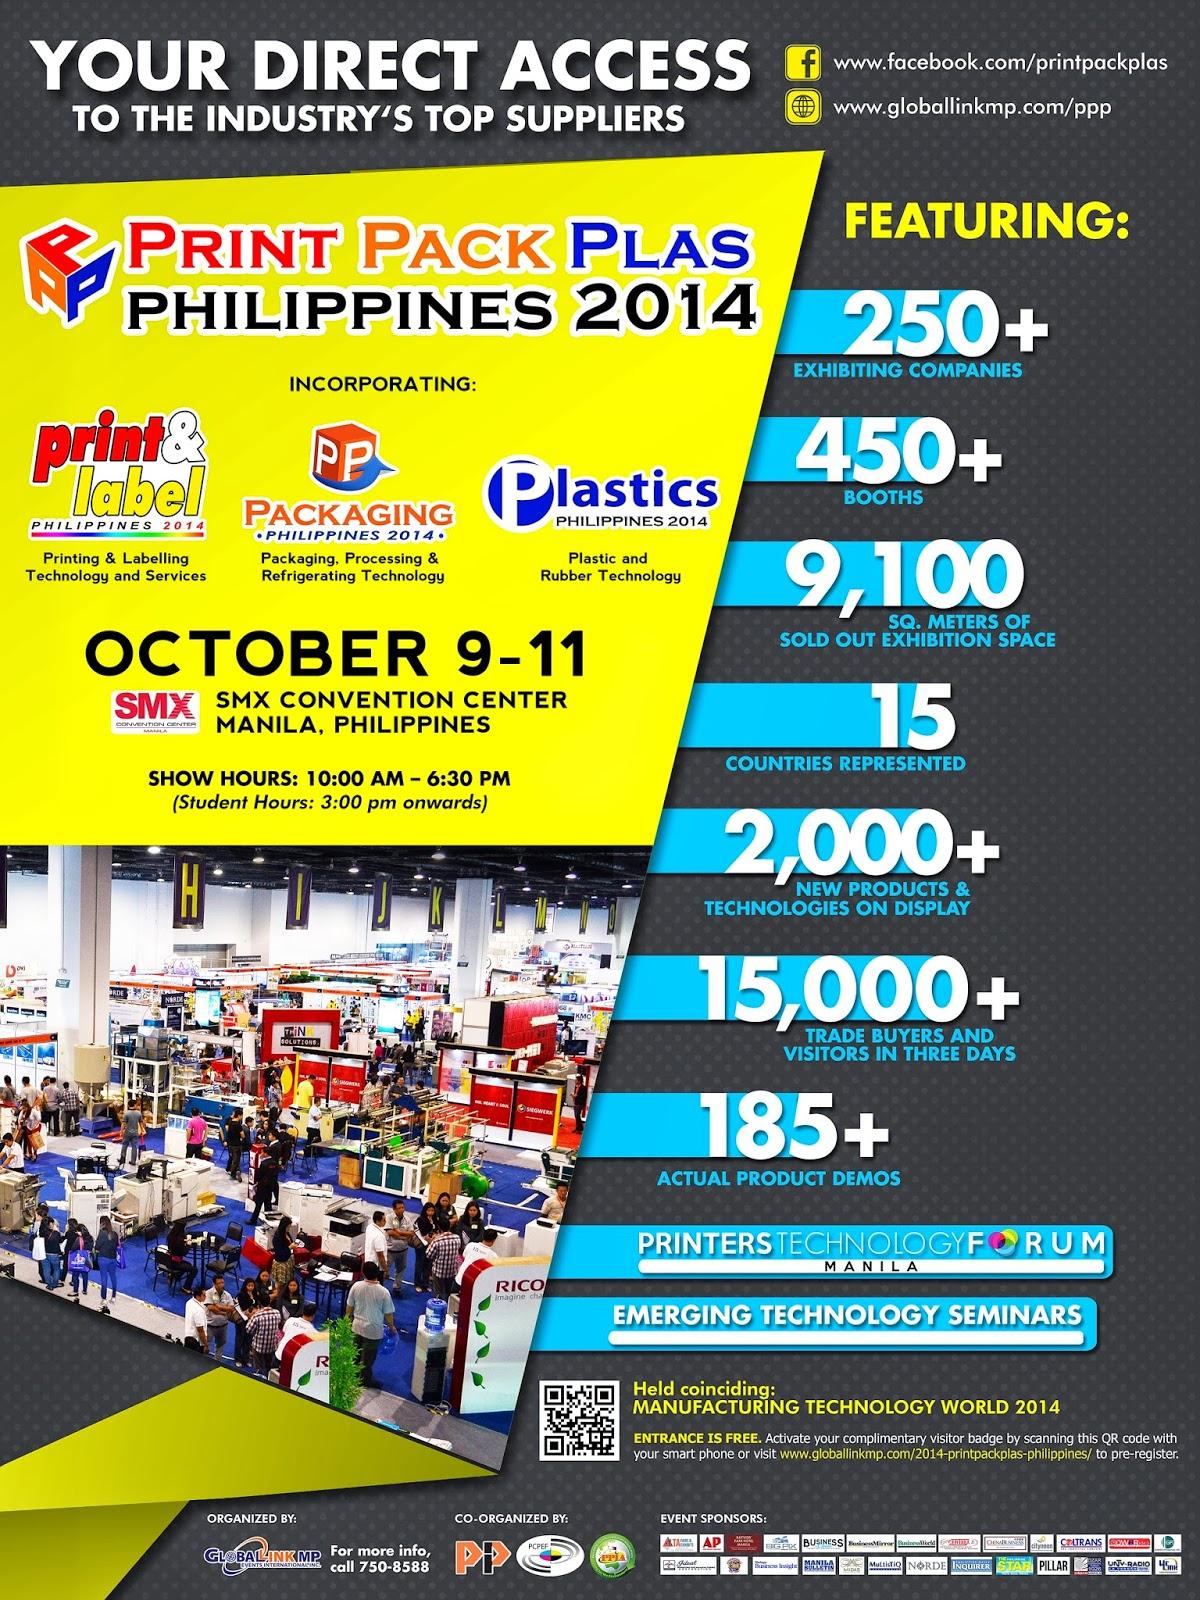 PrintPackPlas Philippines 2014